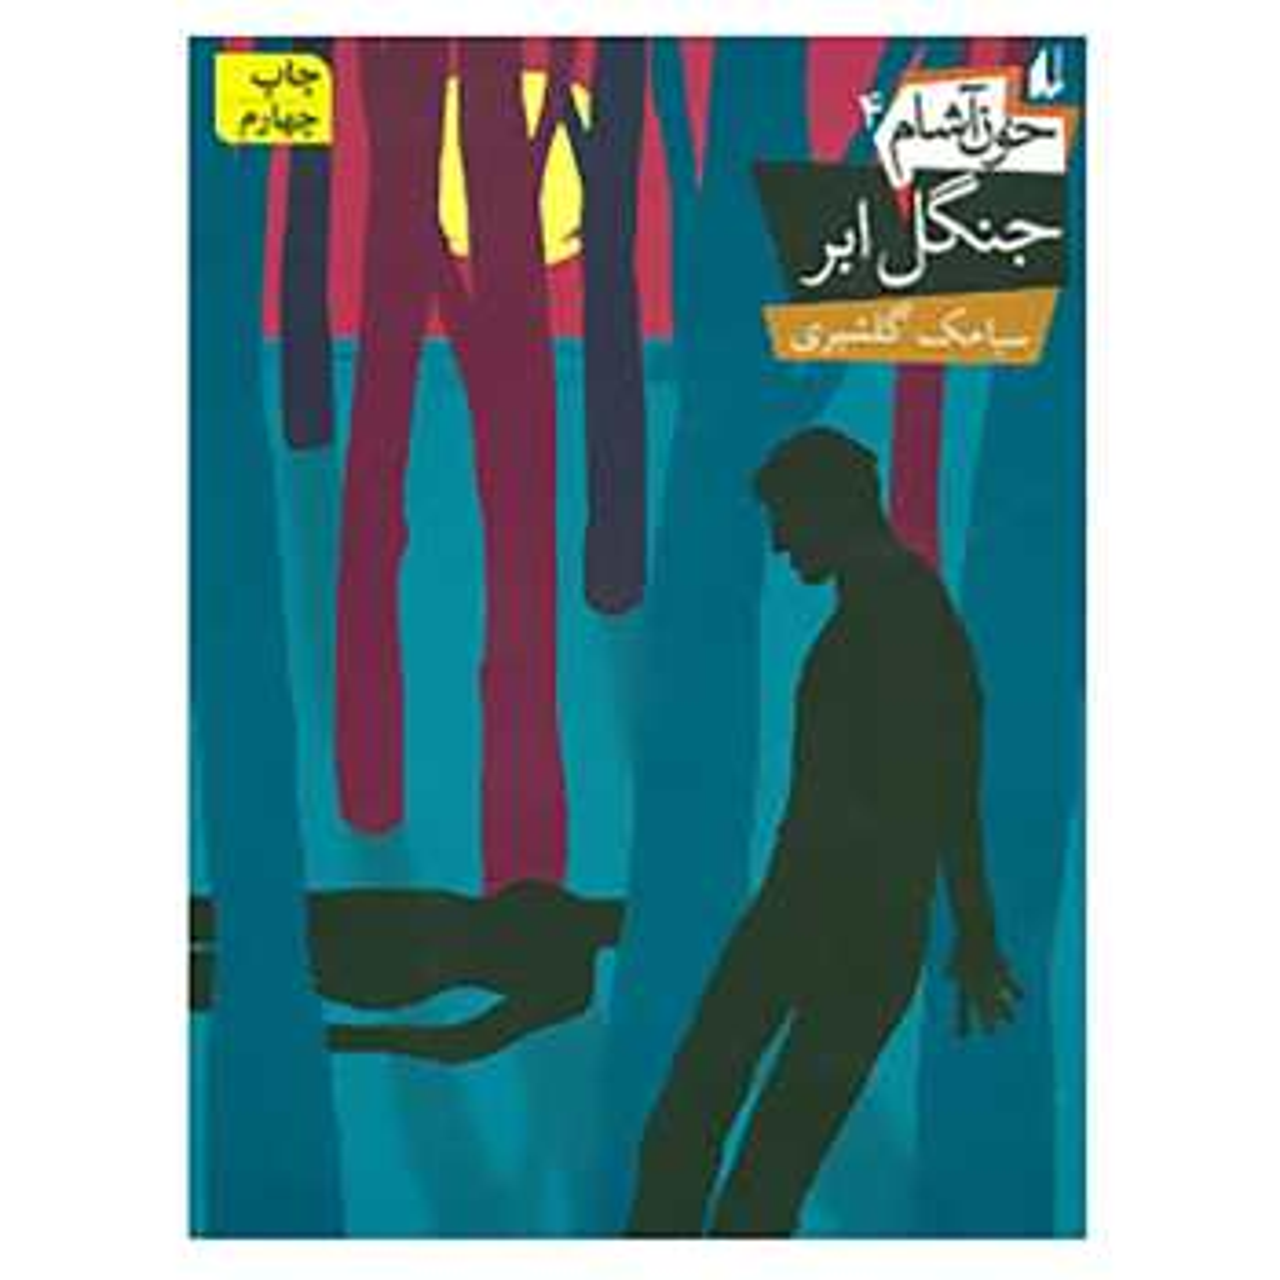 کتاب خون آشام 4 اثر سیامک گلشیری